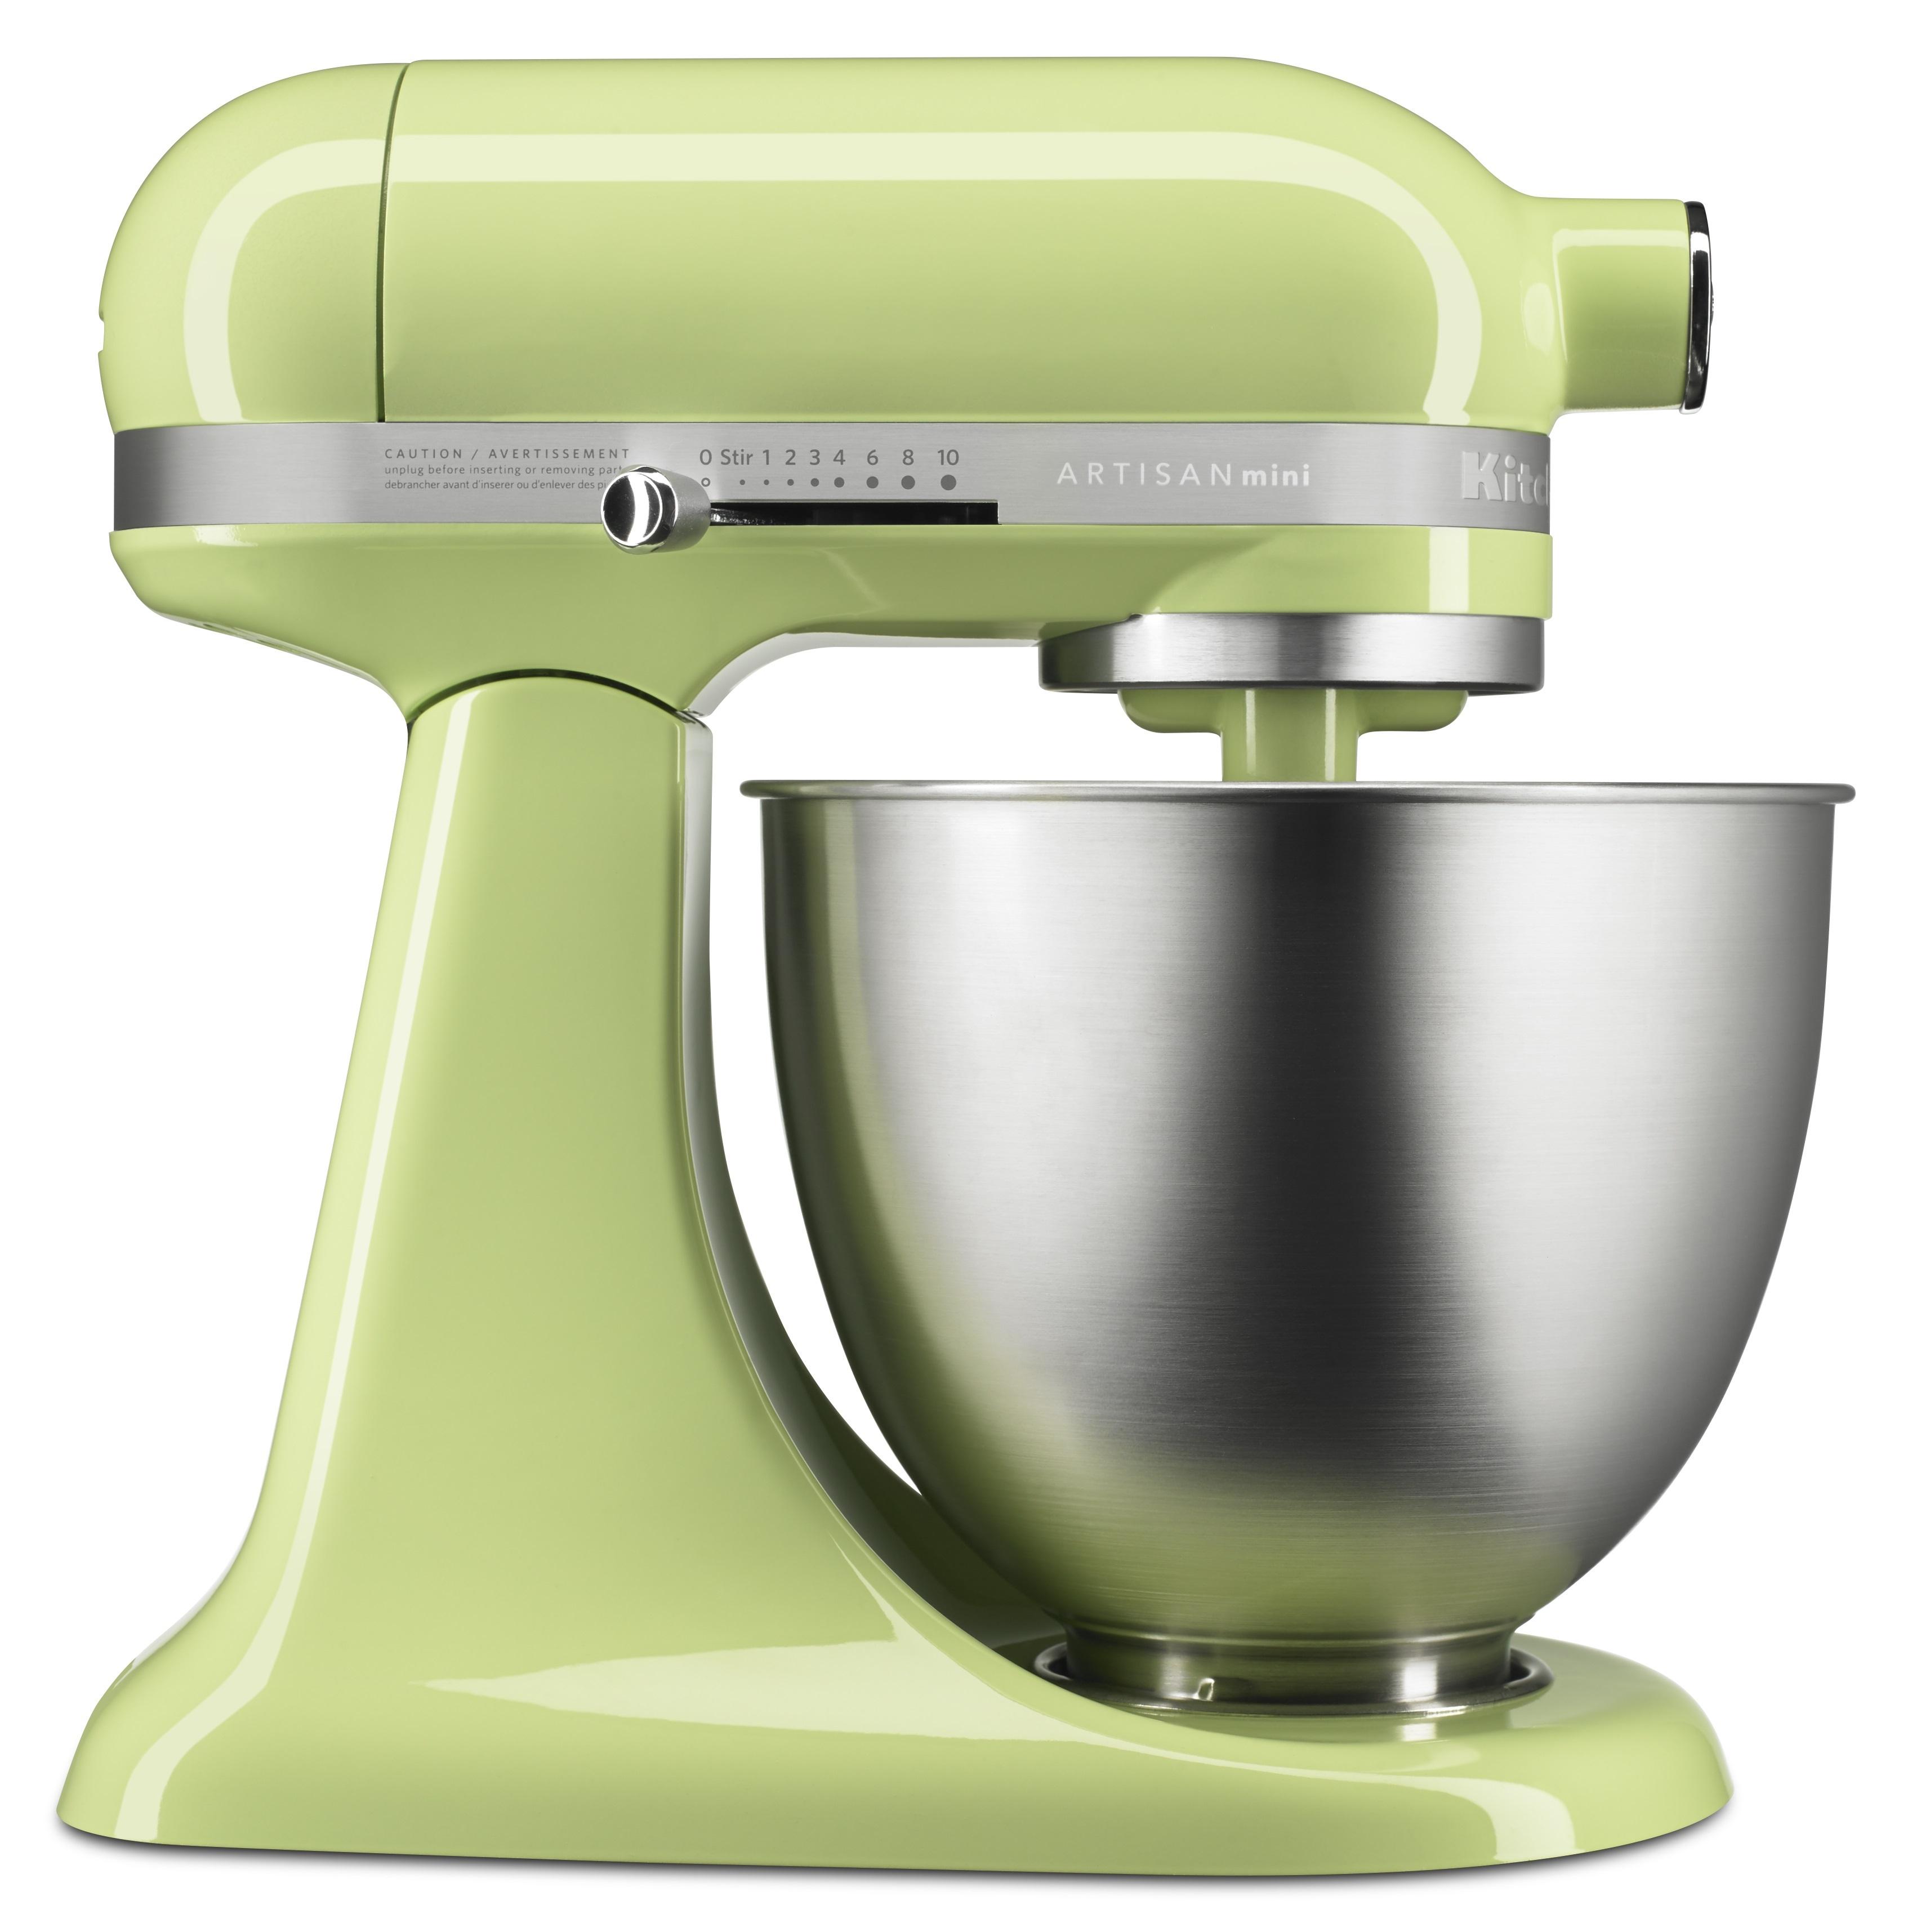 KitchenAid Stand Mixer Artisan Mini 3.5Qt Tilt Head (Honey Dew) - 5KSM3311XEHW